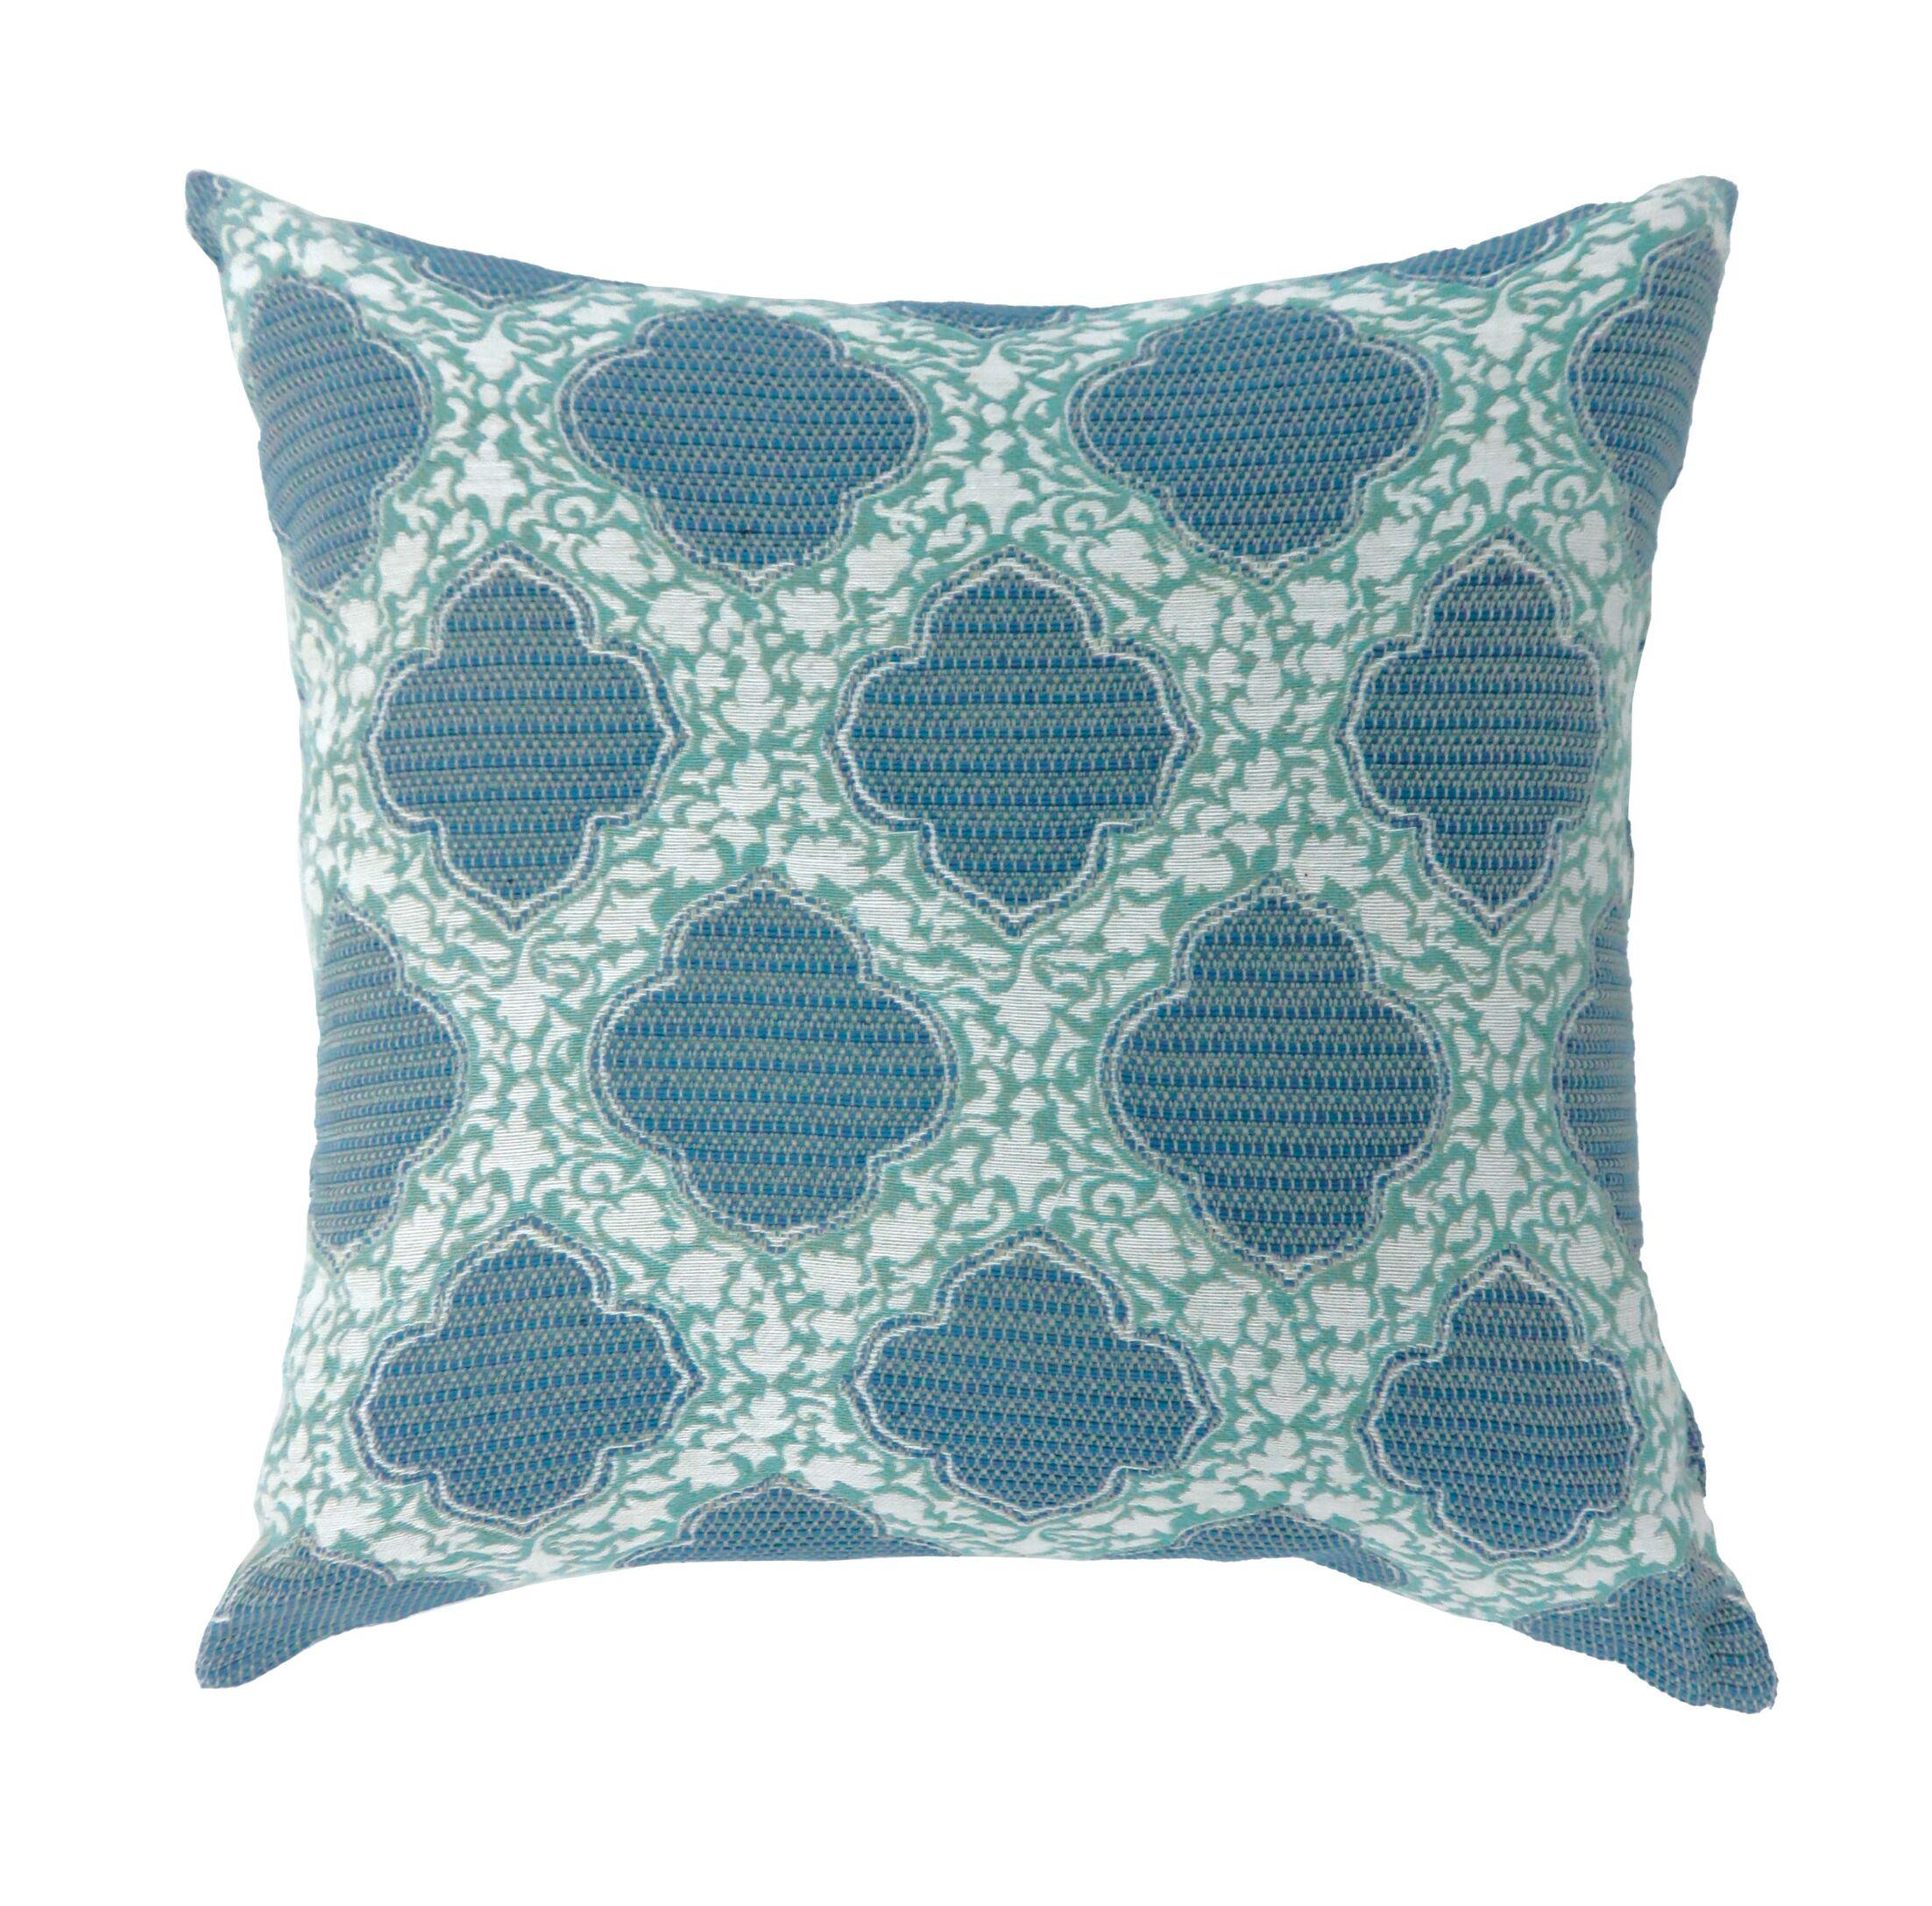 Socorro Contemporary Throw Pillow Color: Blue, Size: 22